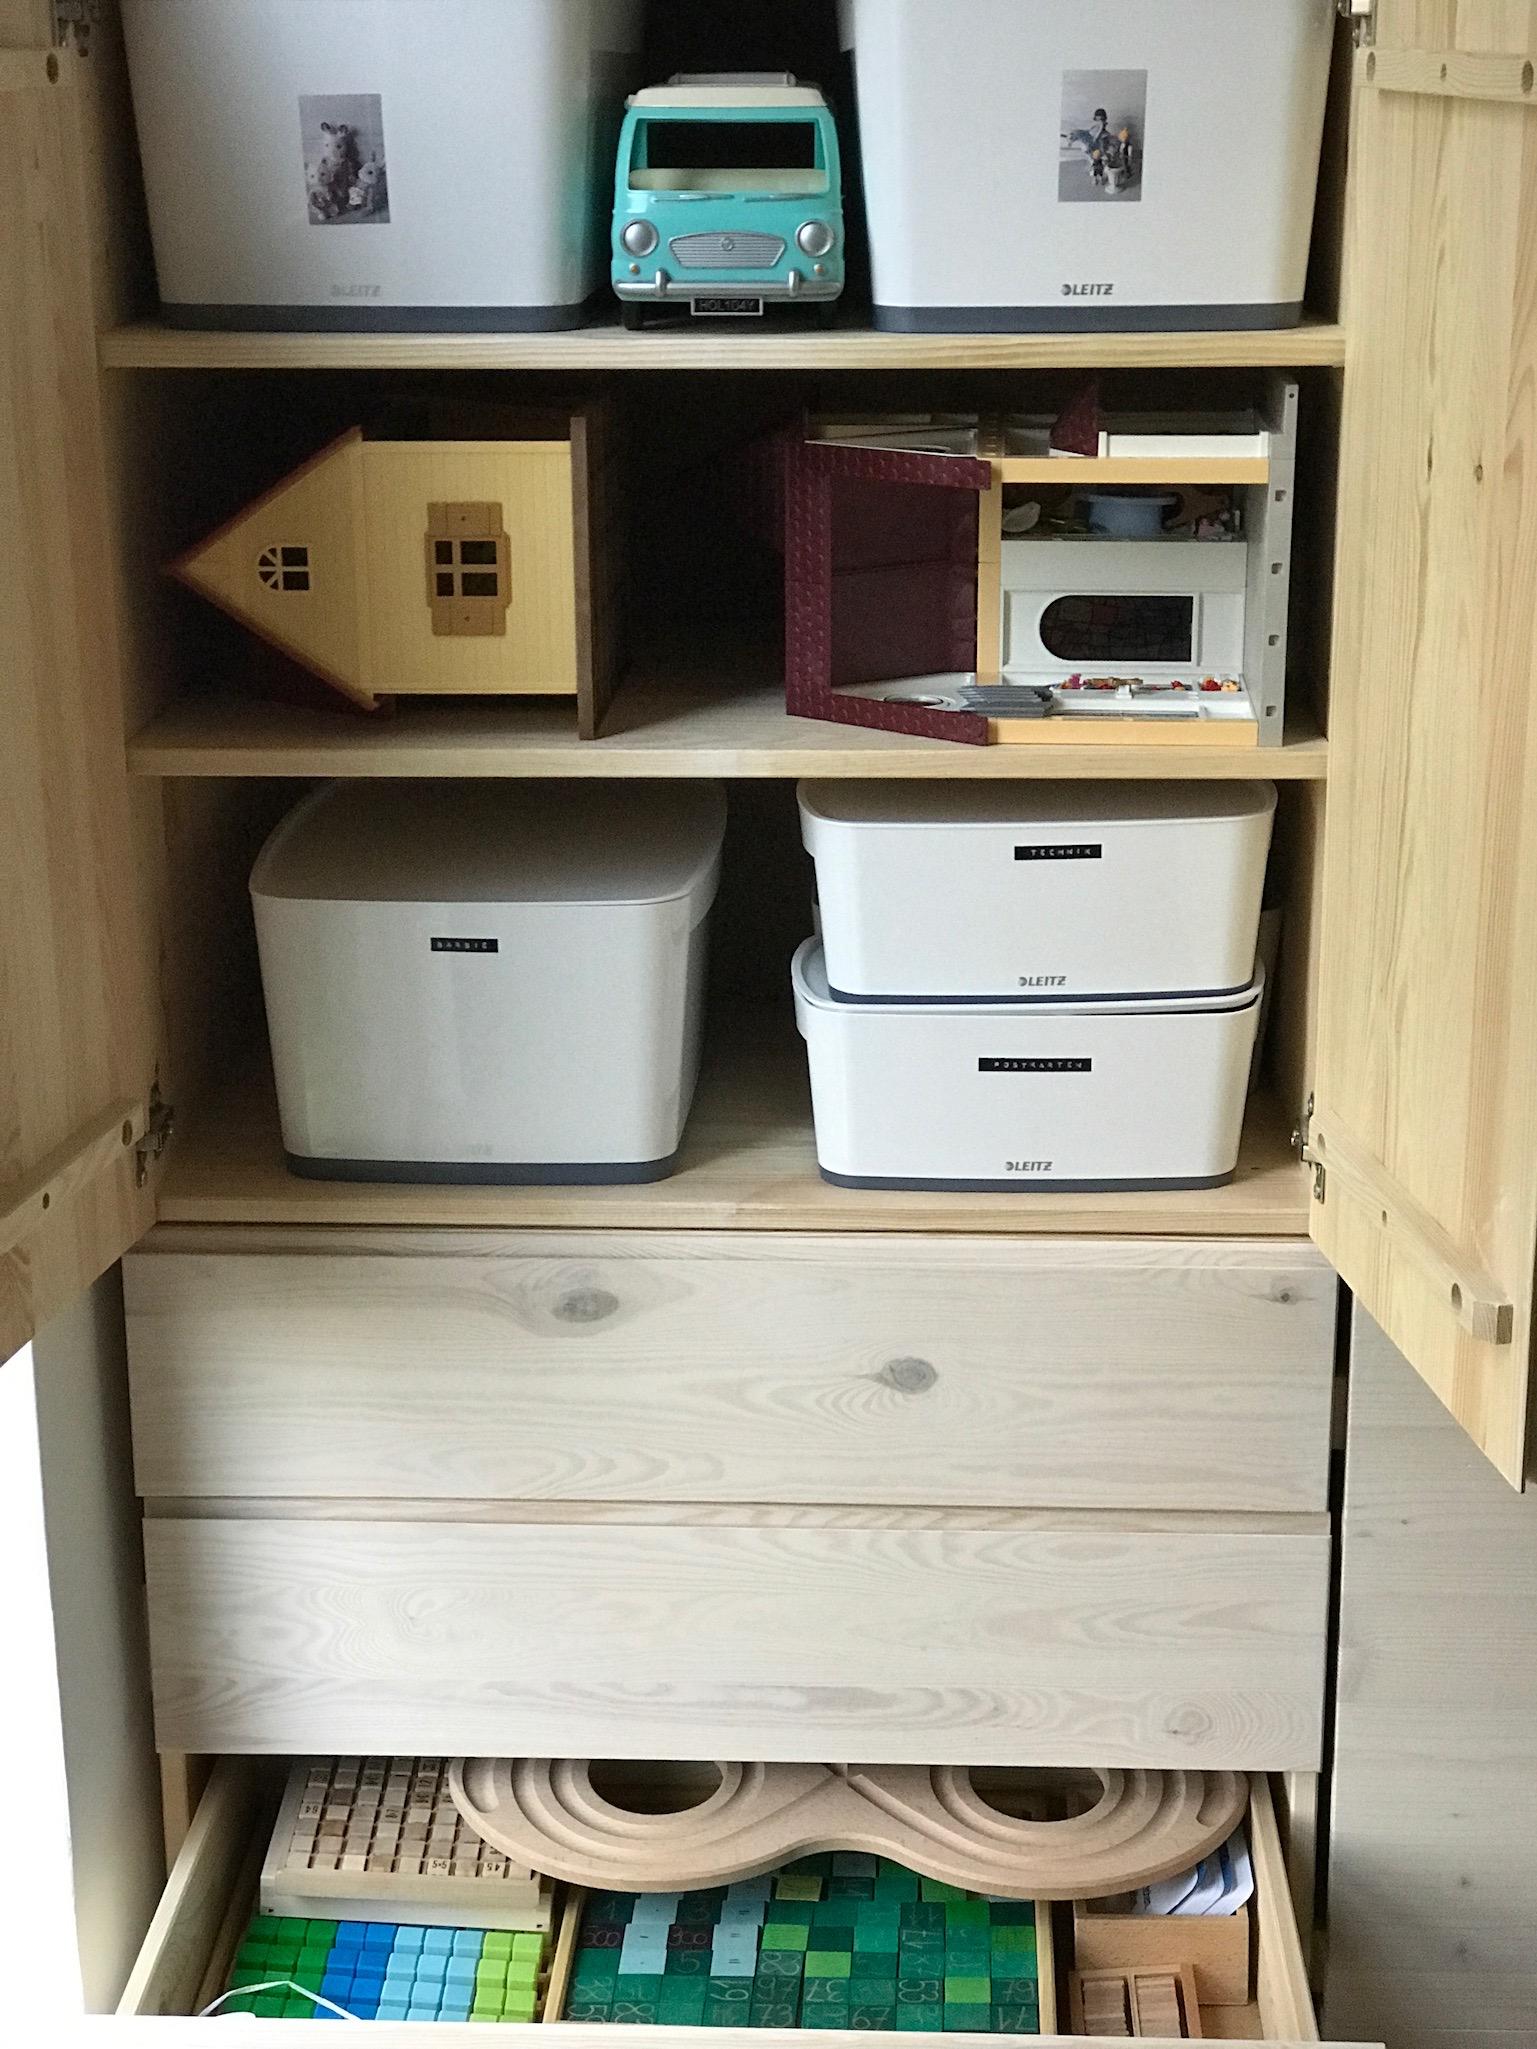 ordnung in schubladen trendy ordnung mit schubladen with ordnung in schubladen amazing nmlich. Black Bedroom Furniture Sets. Home Design Ideas